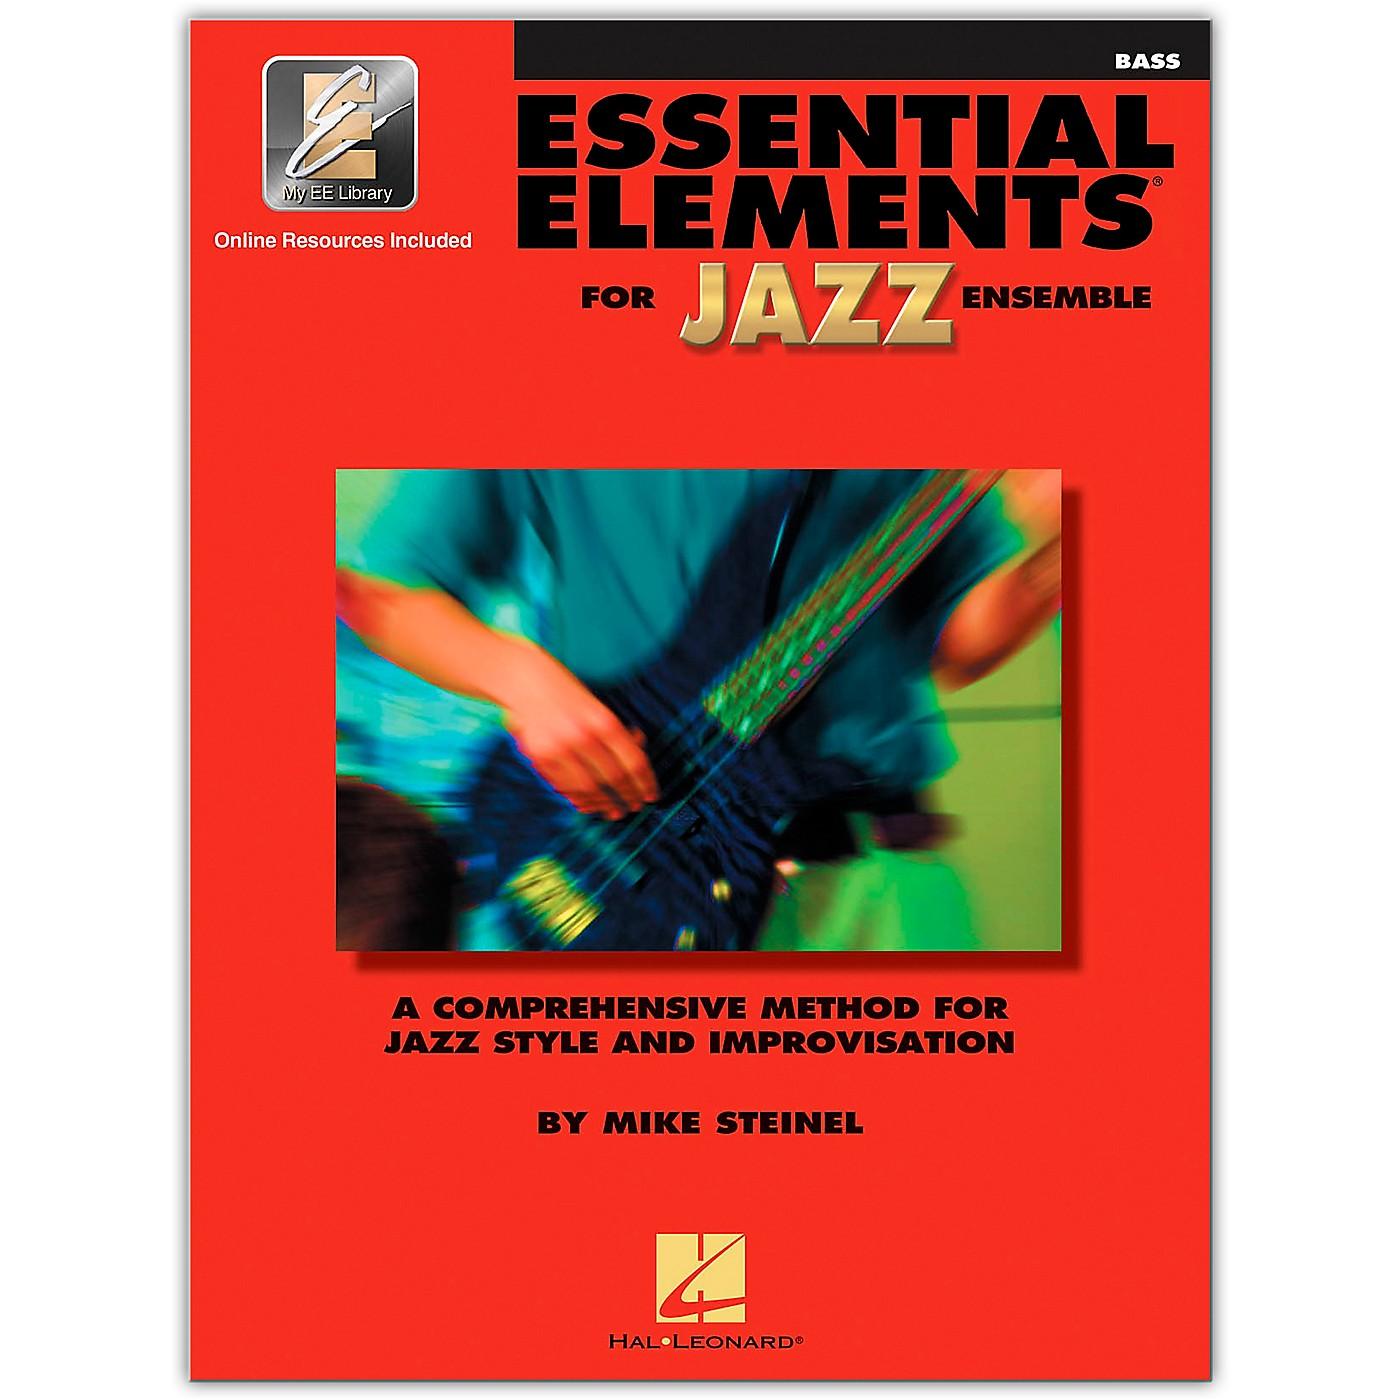 Hal Leonard Essential Elements for Jazz Ensemble - Bass (Book/Online Audio) thumbnail